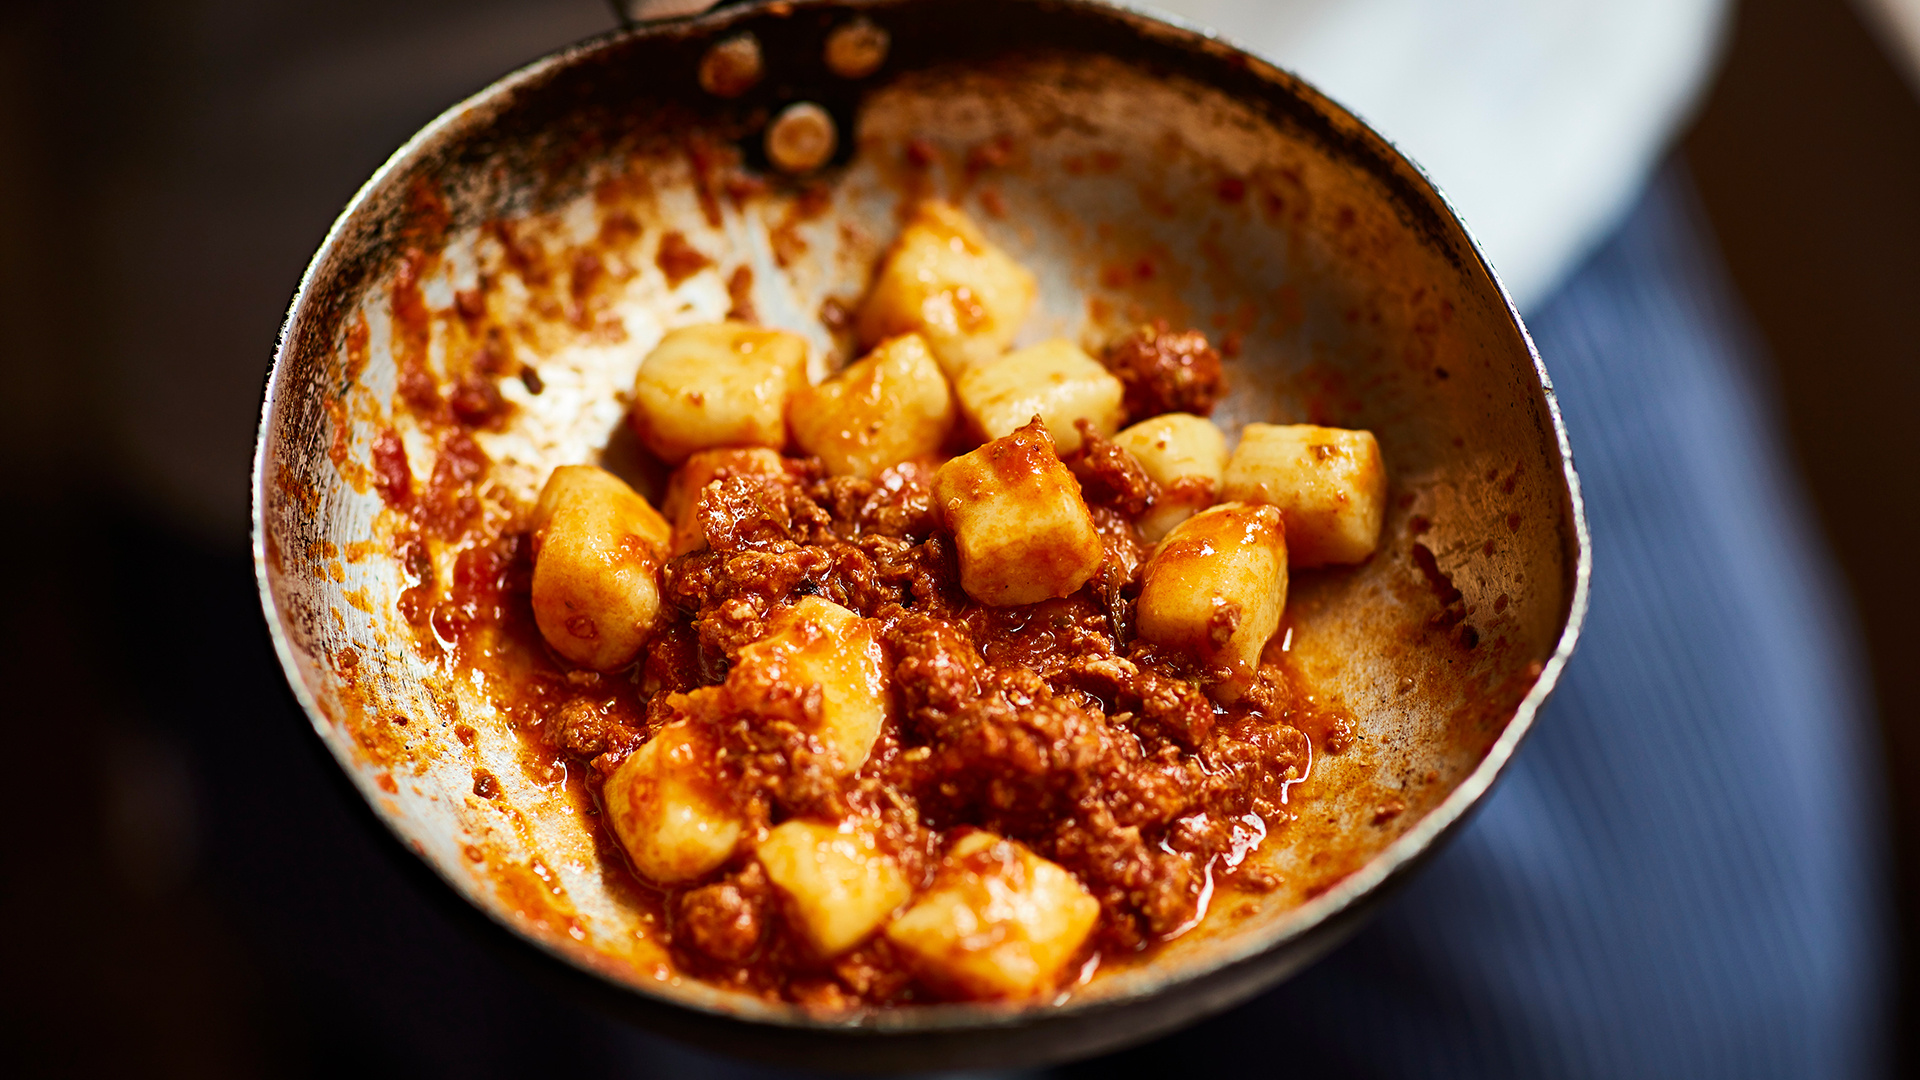 Best Regional Italian Restaurants in London: Gnocchi with sausage ragu at Bocca Di Lupo